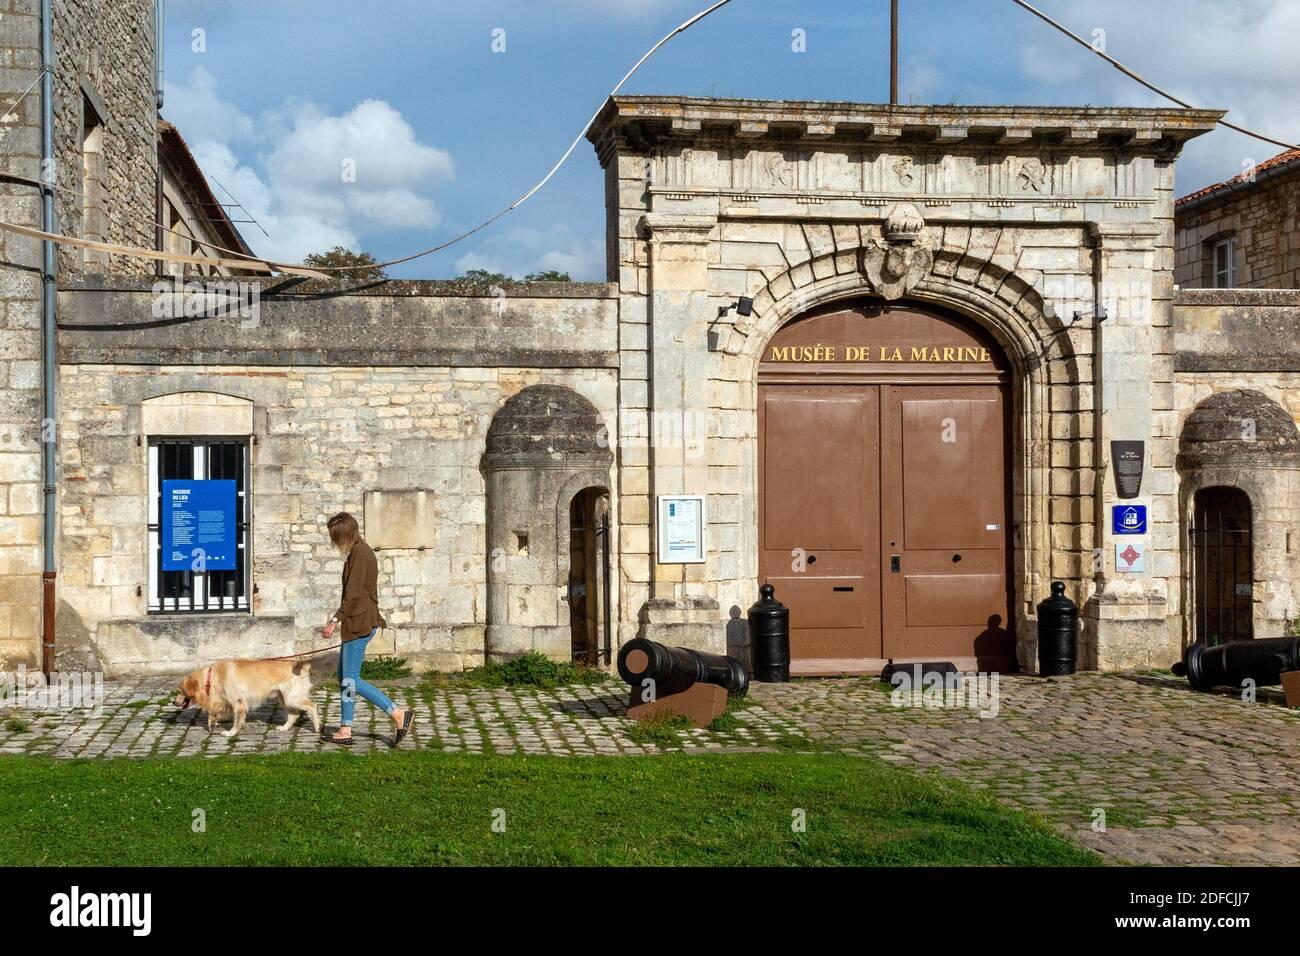 MUSEO MARINO, ROCHEFORT, CHARENTE-MARITIME, FRANCIA Foto de stock